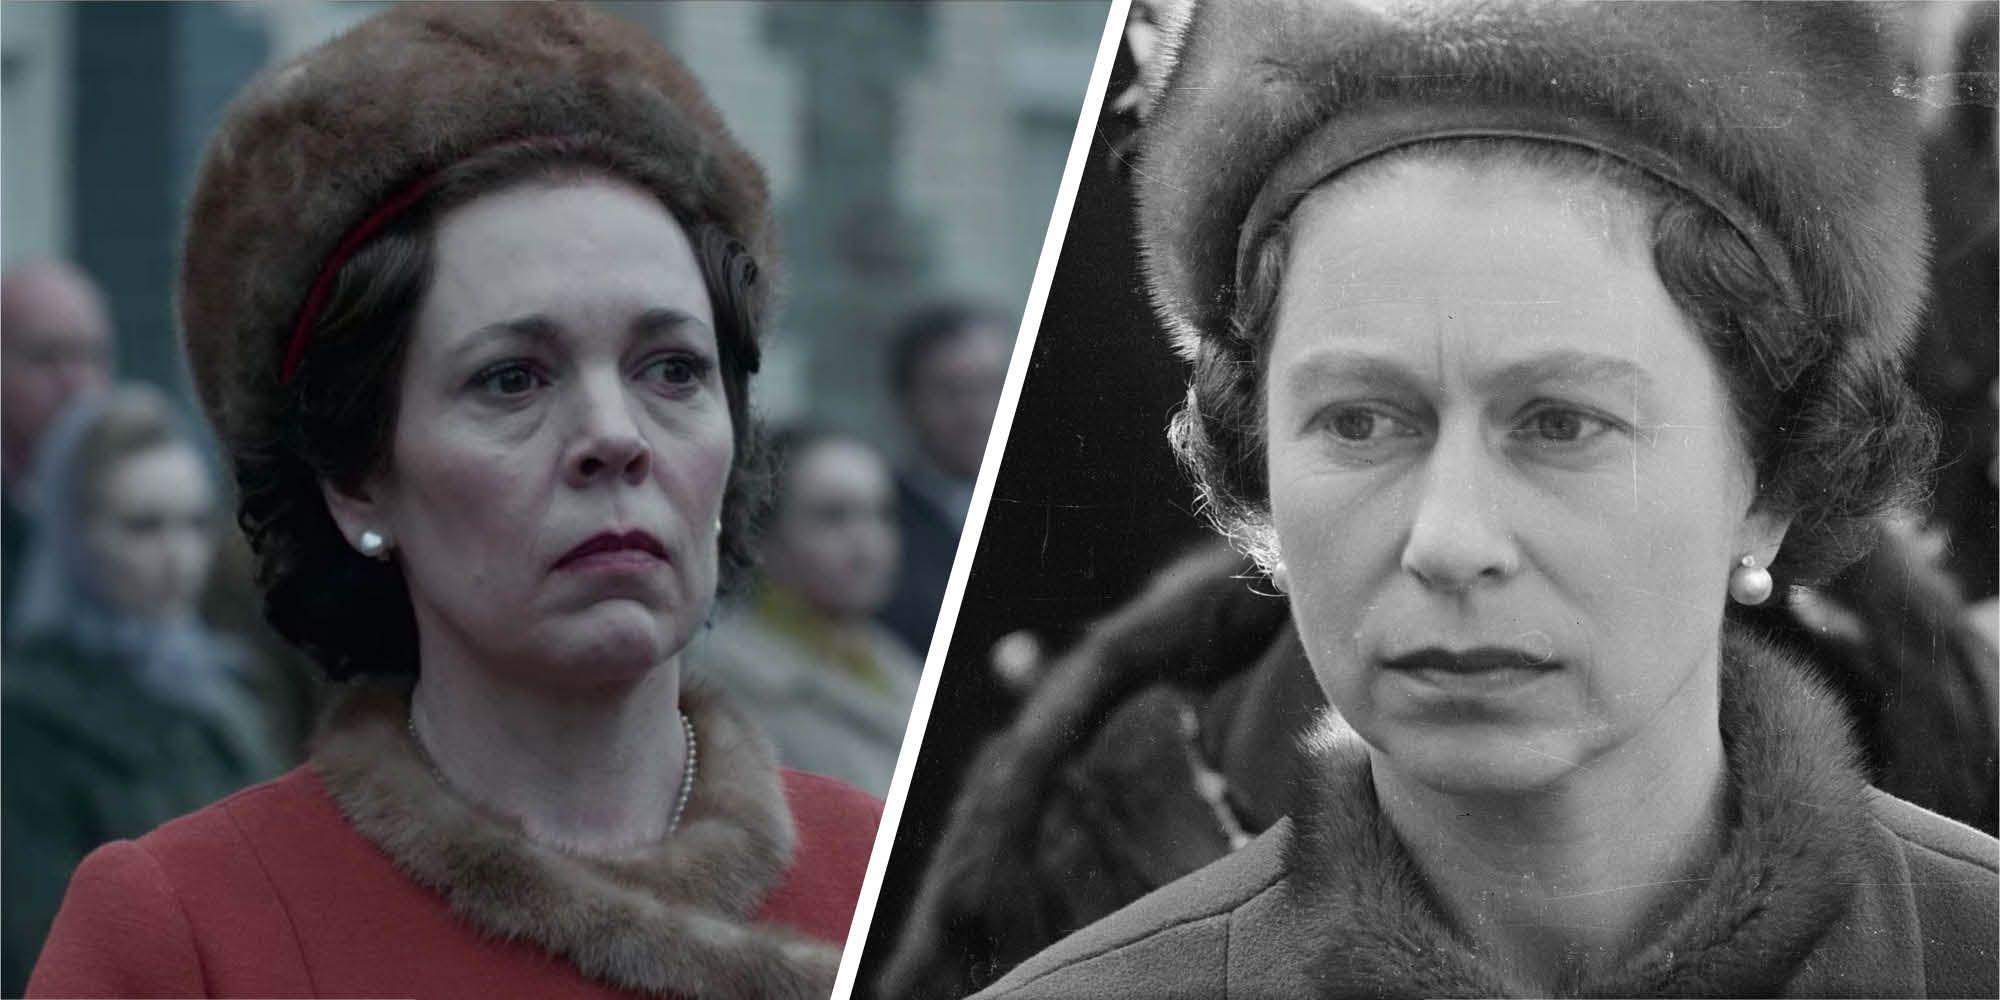 The Crown season 3 scenes vs the real life royal photos